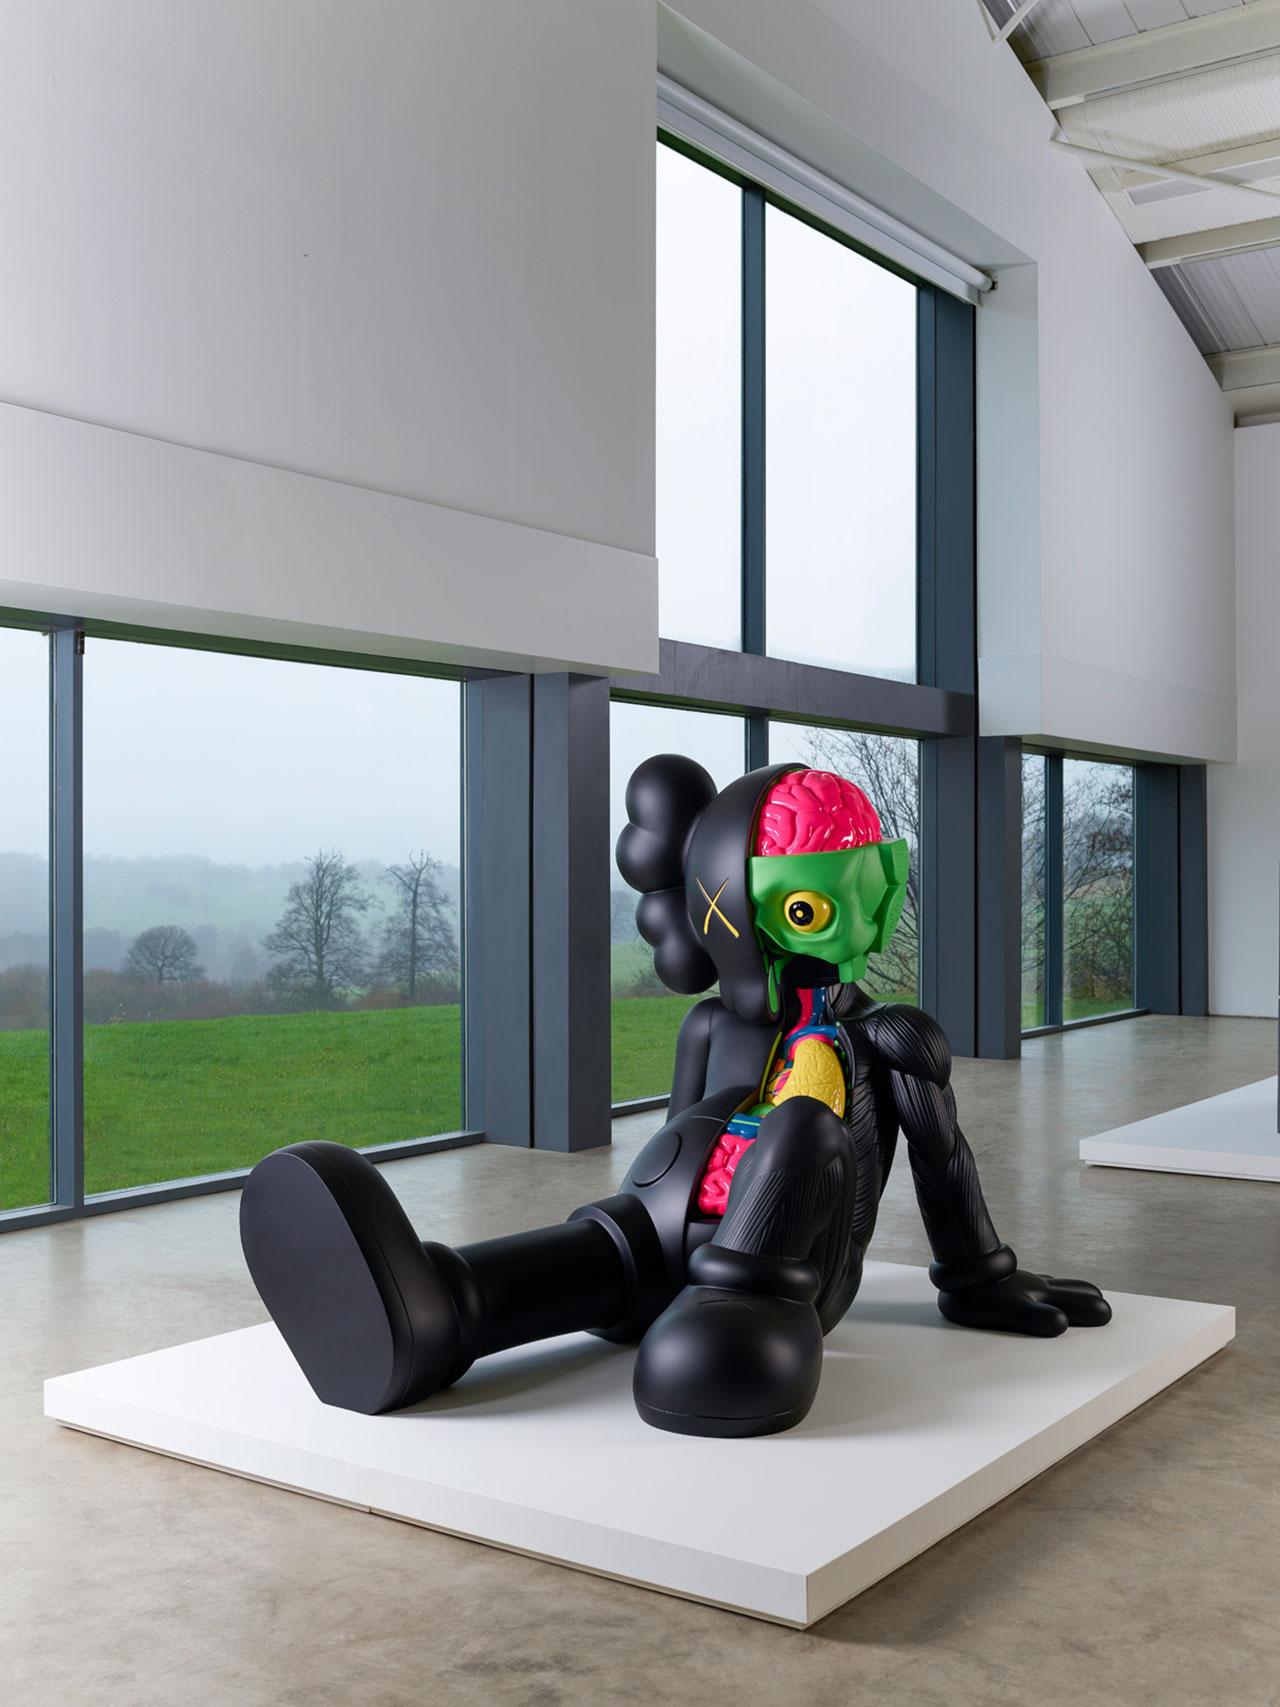 Companion (Resting Place), 2013.Courtesy the artist and YSP Painted aluminium H153.7cm x W160cm x D203.2. Photo © Jonty Wilde.